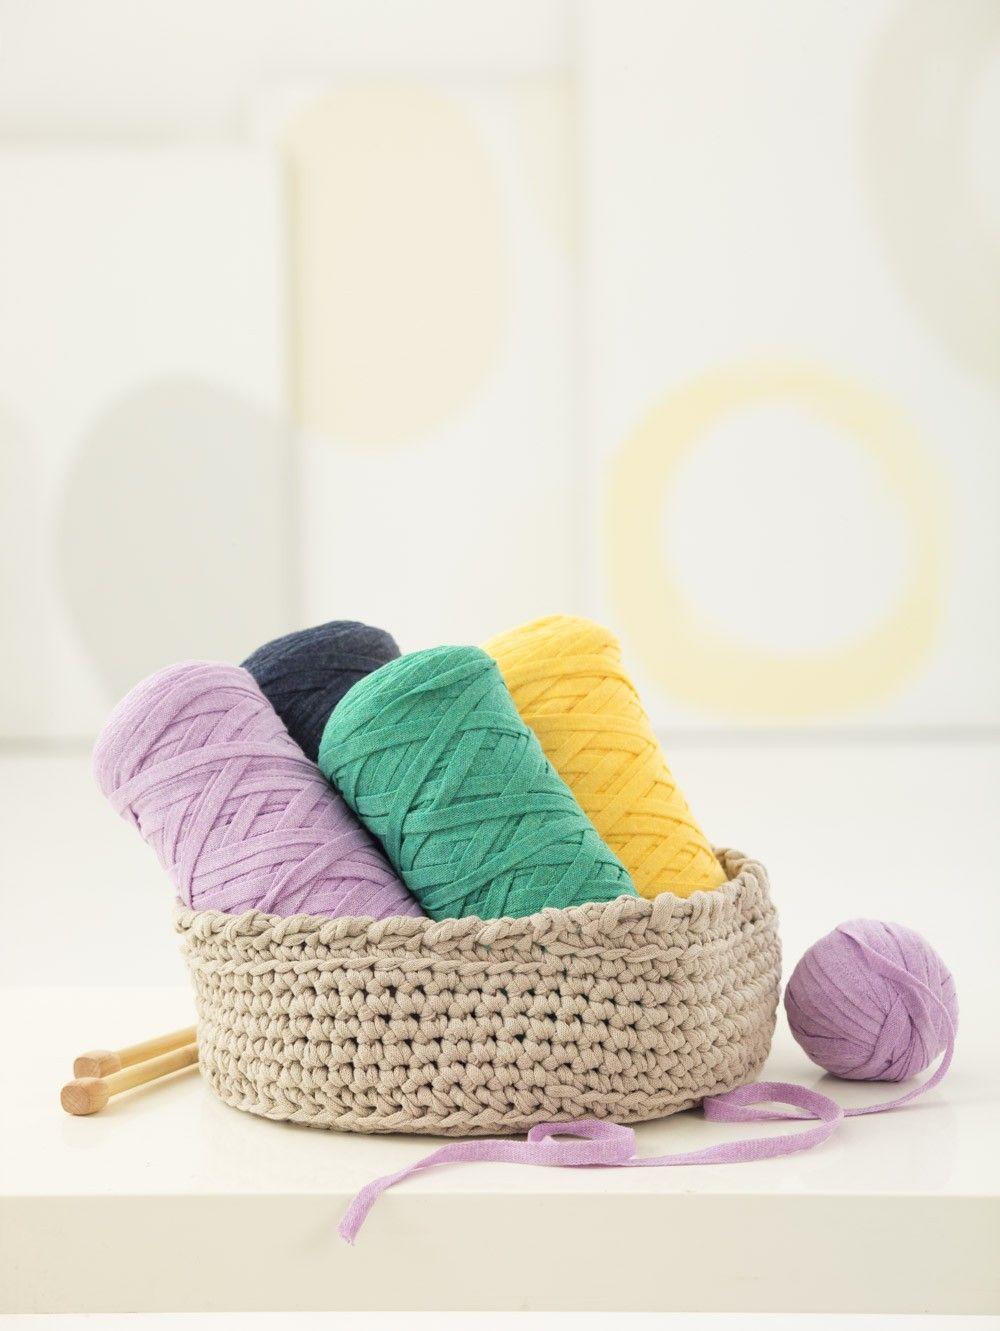 Crochet Bowl - Lion Brand Yarn | CrochetDesign | Pinterest